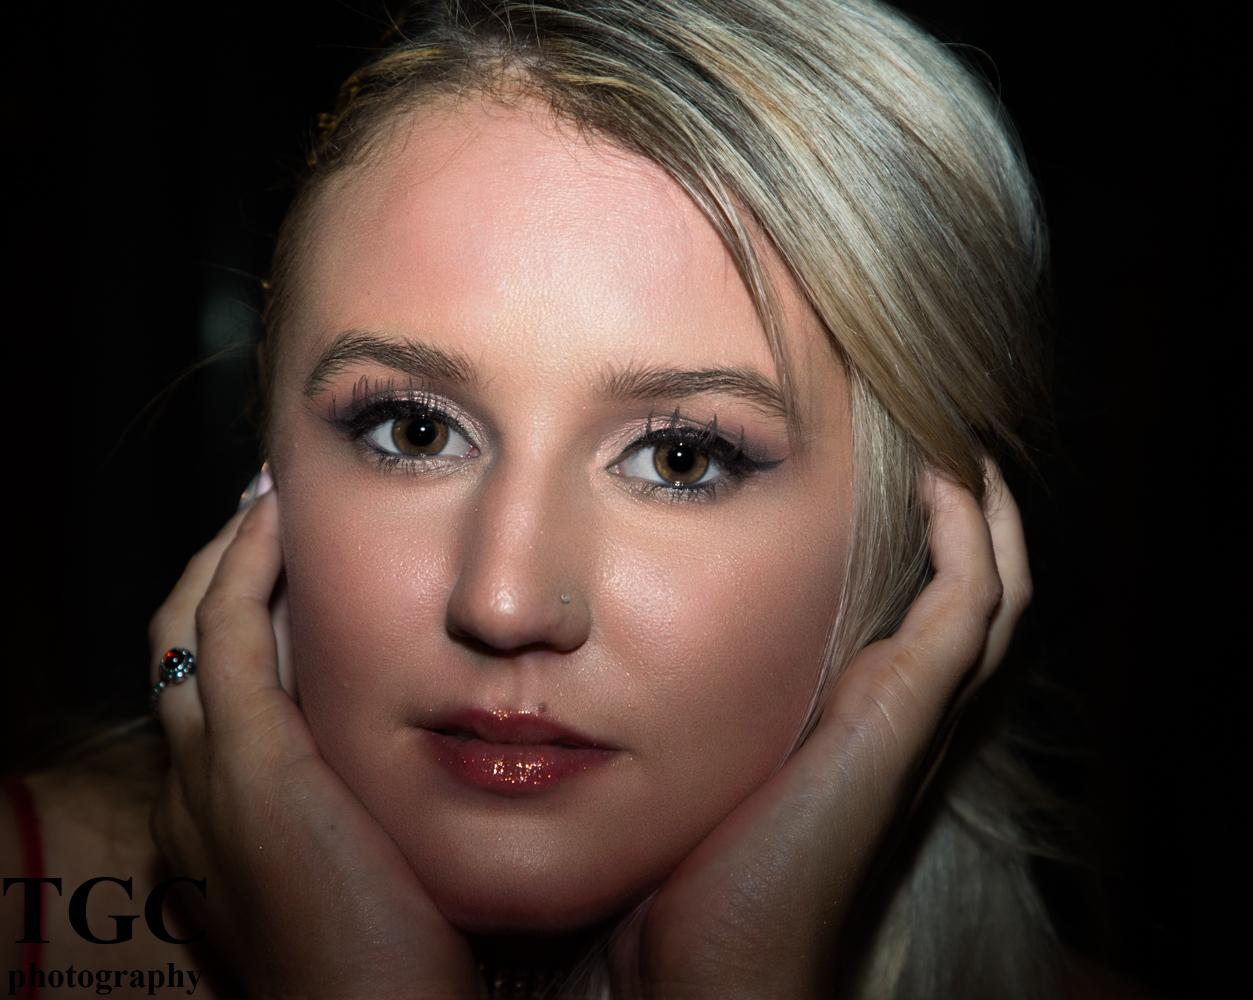 Allison-Harmony